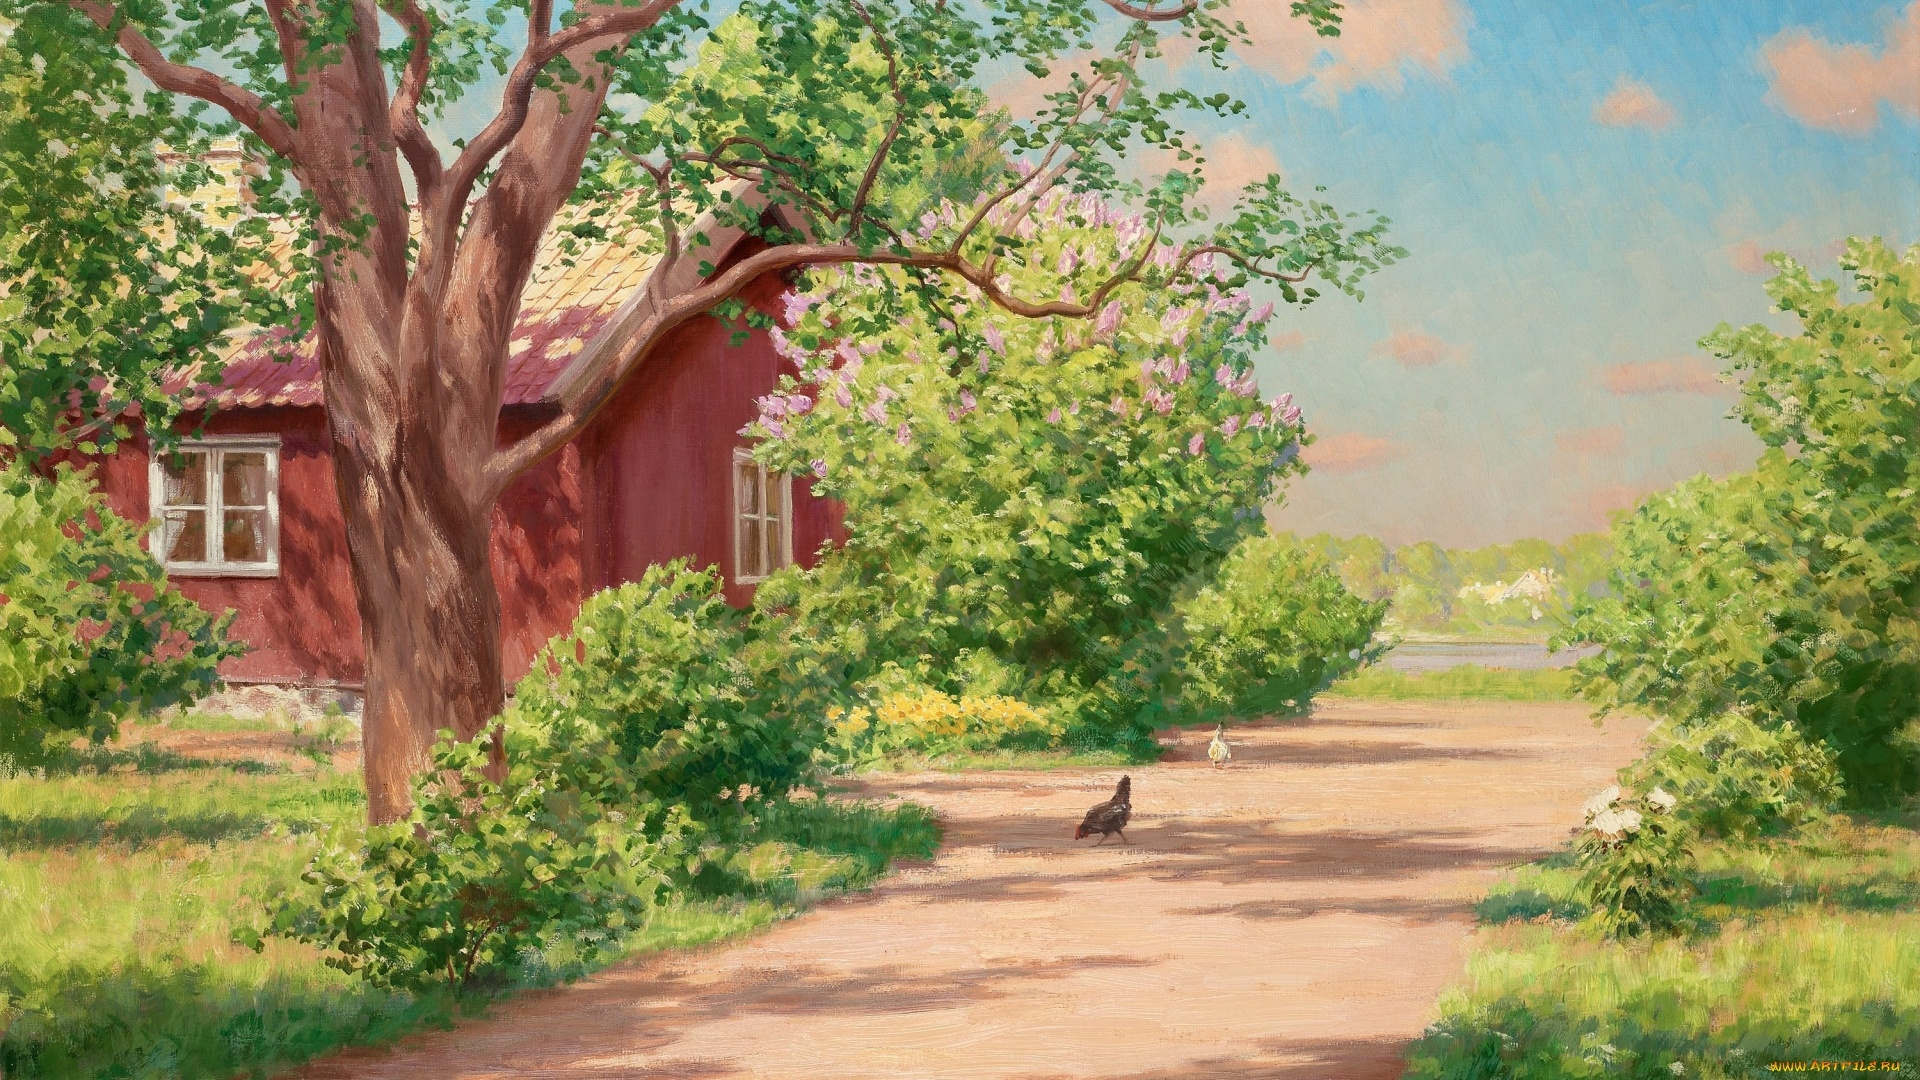 Village House Art HD Wallpaper